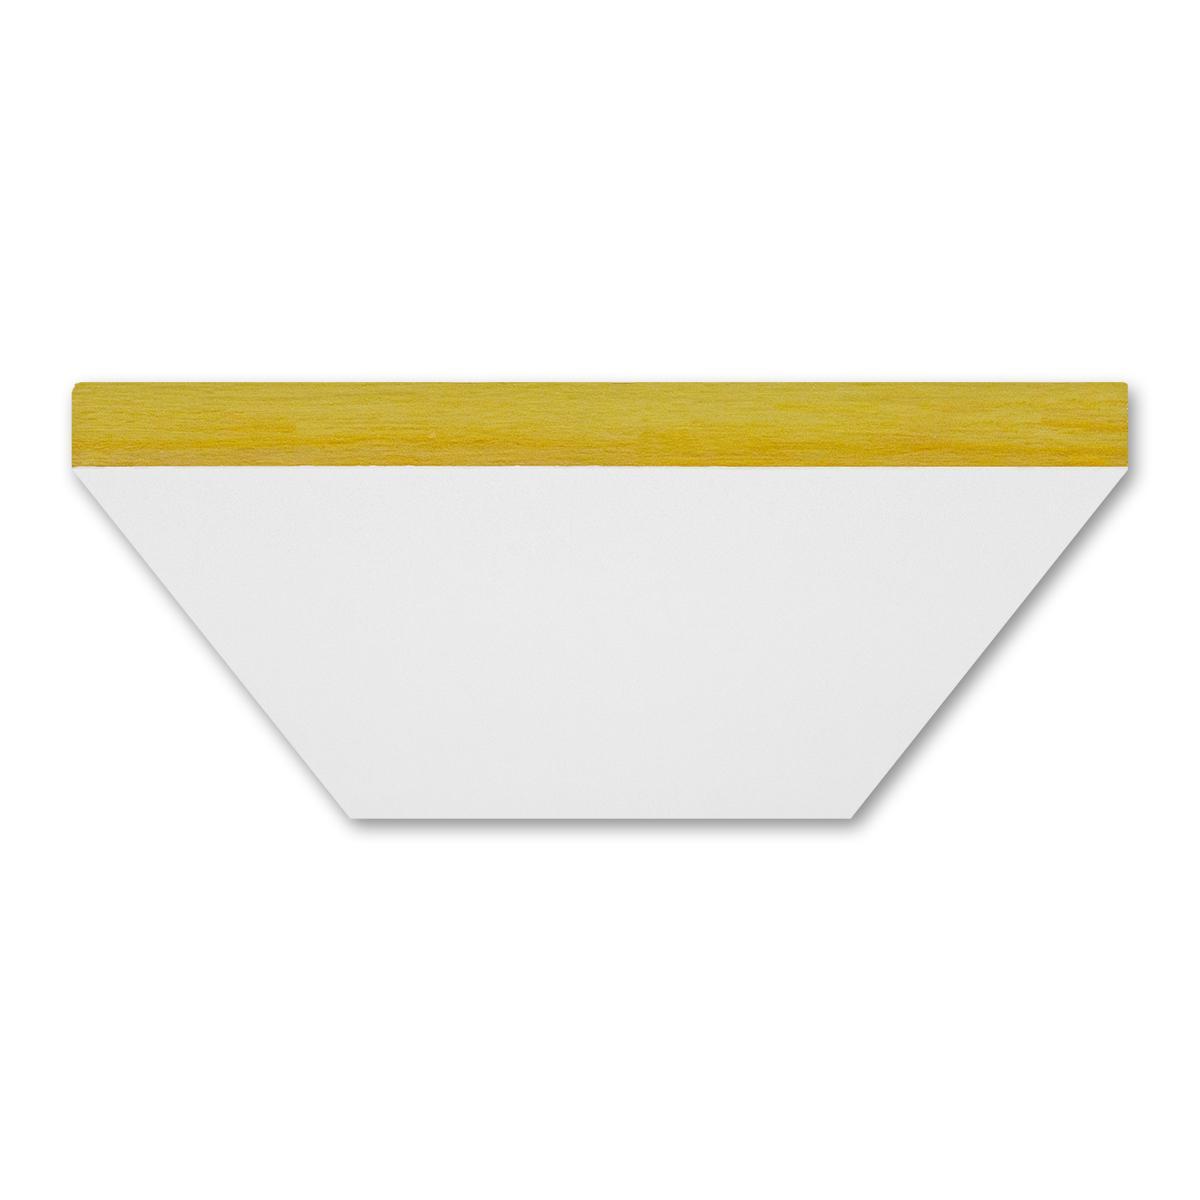 Charming 1 X 1 Acoustic Ceiling Tiles Thick 12X12 Vinyl Floor Tile Round 1950S Floor Tiles 2 Inch Hexagon Floor Tile Youthful 24 X 48 Ceiling Tiles Dark2X4 Fiberglass Ceiling Tiles AcoustiTherm Acoustic Ceiling Tile | Moisture Resistant ..